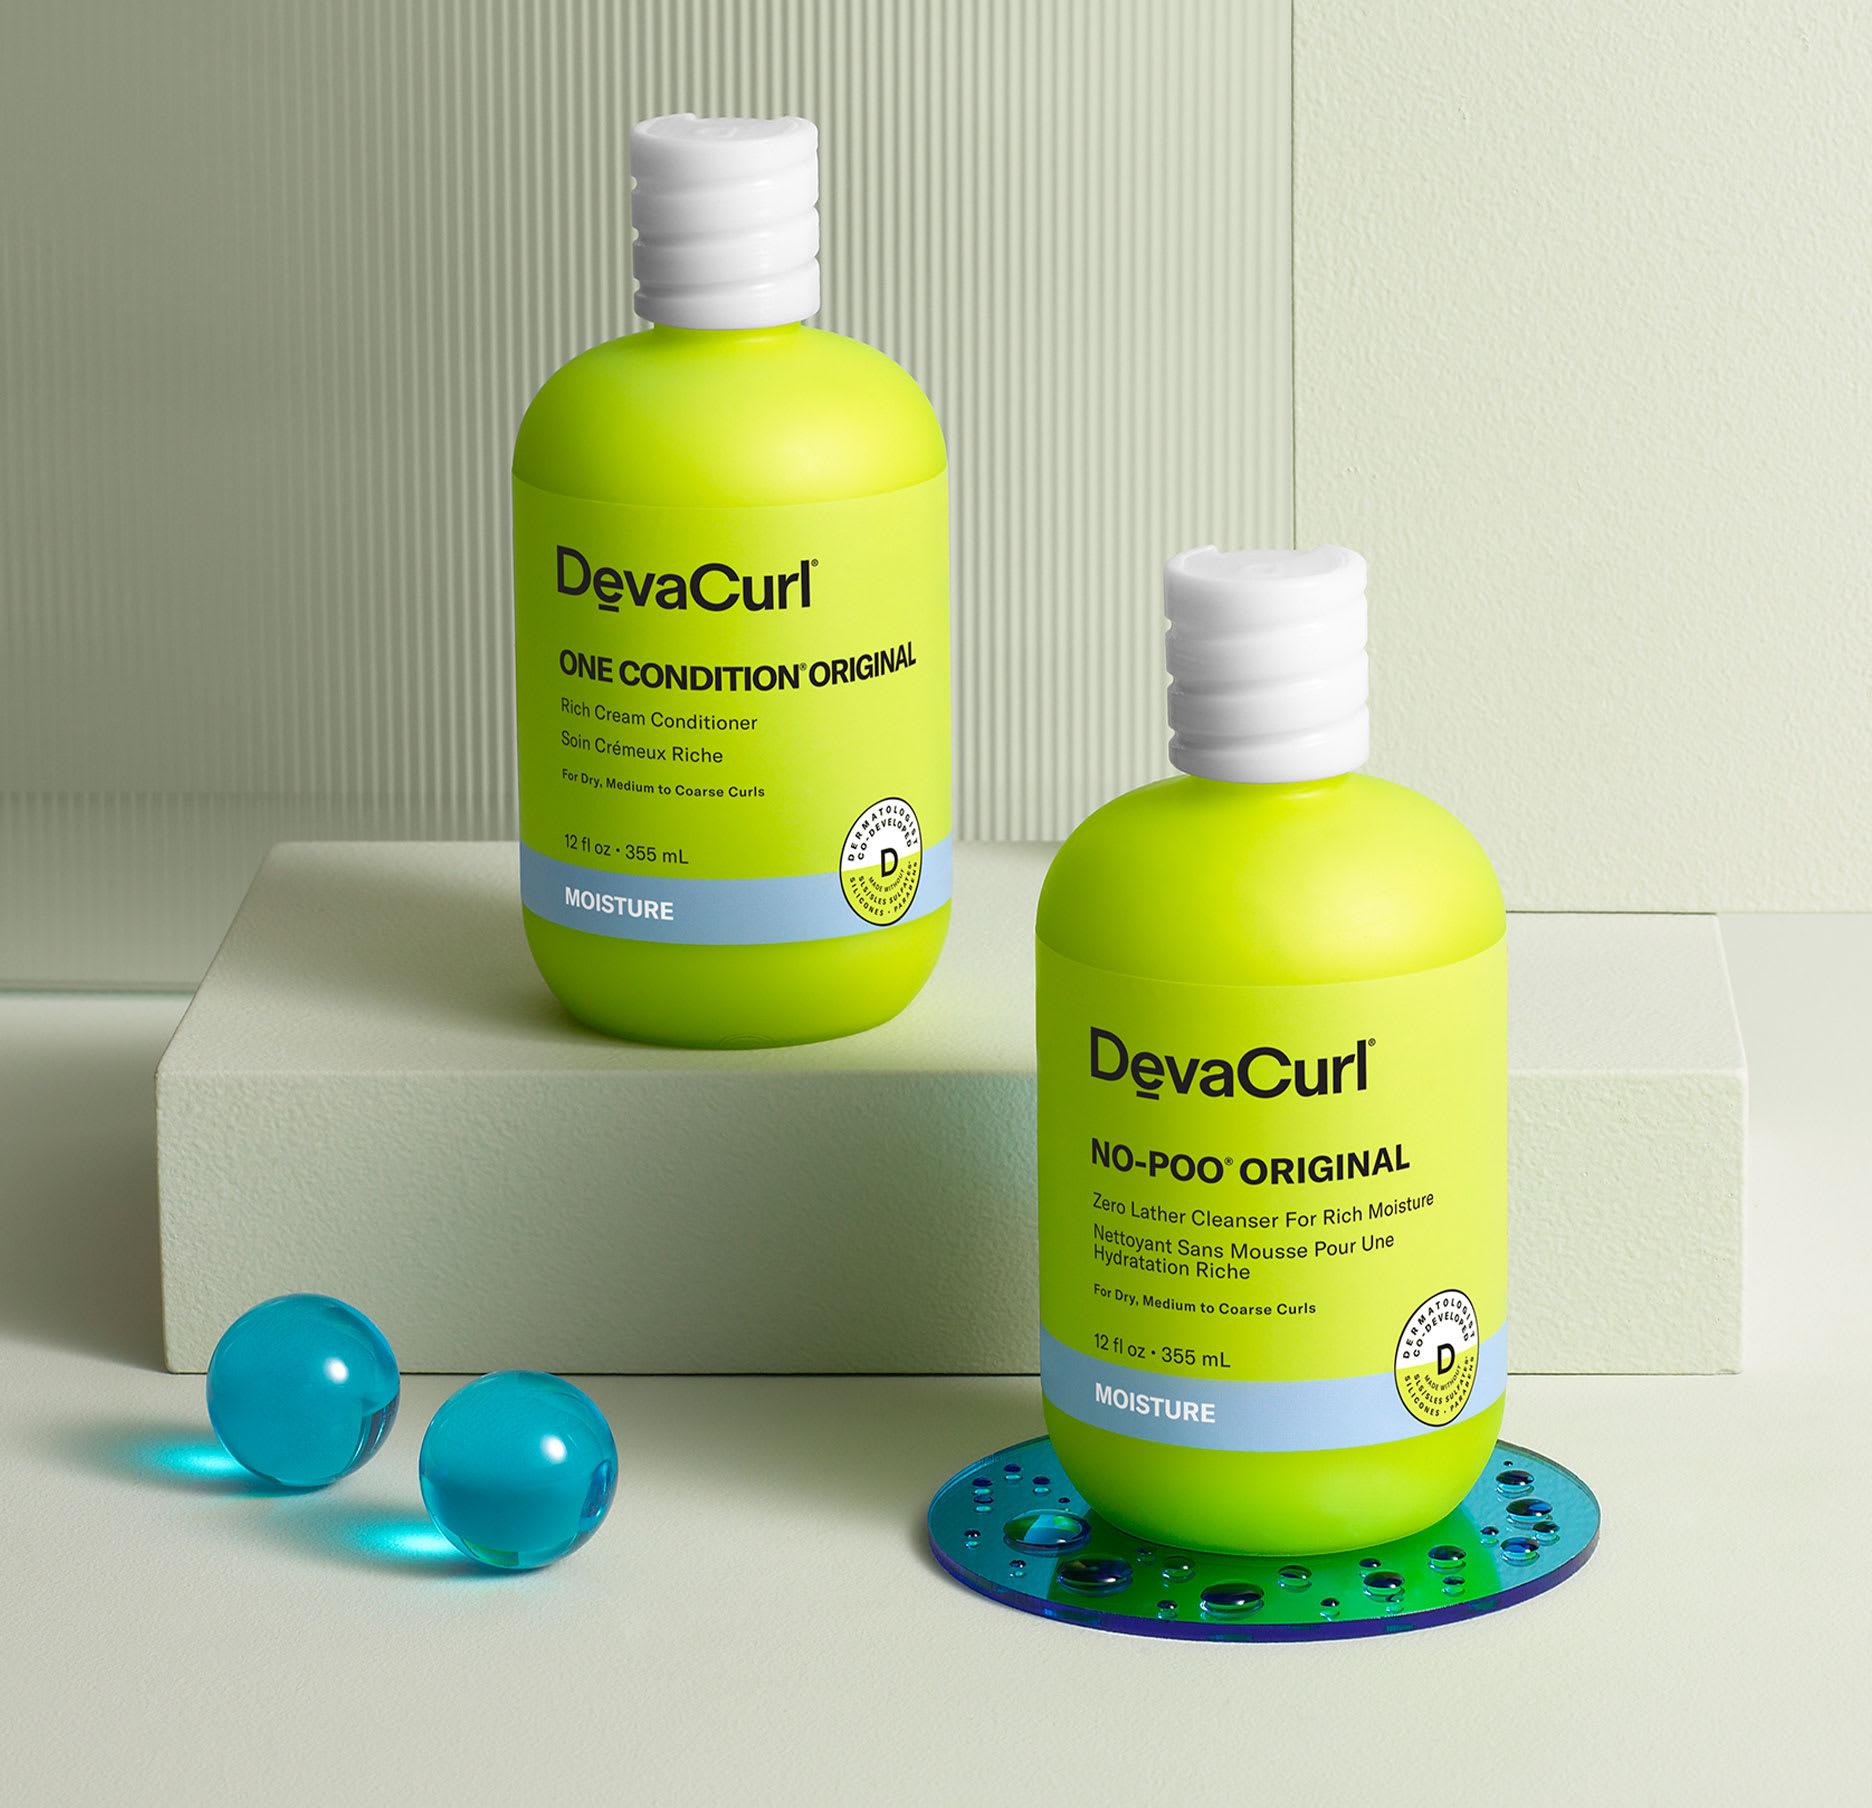 original devacurl cleanser and conditioner bottles